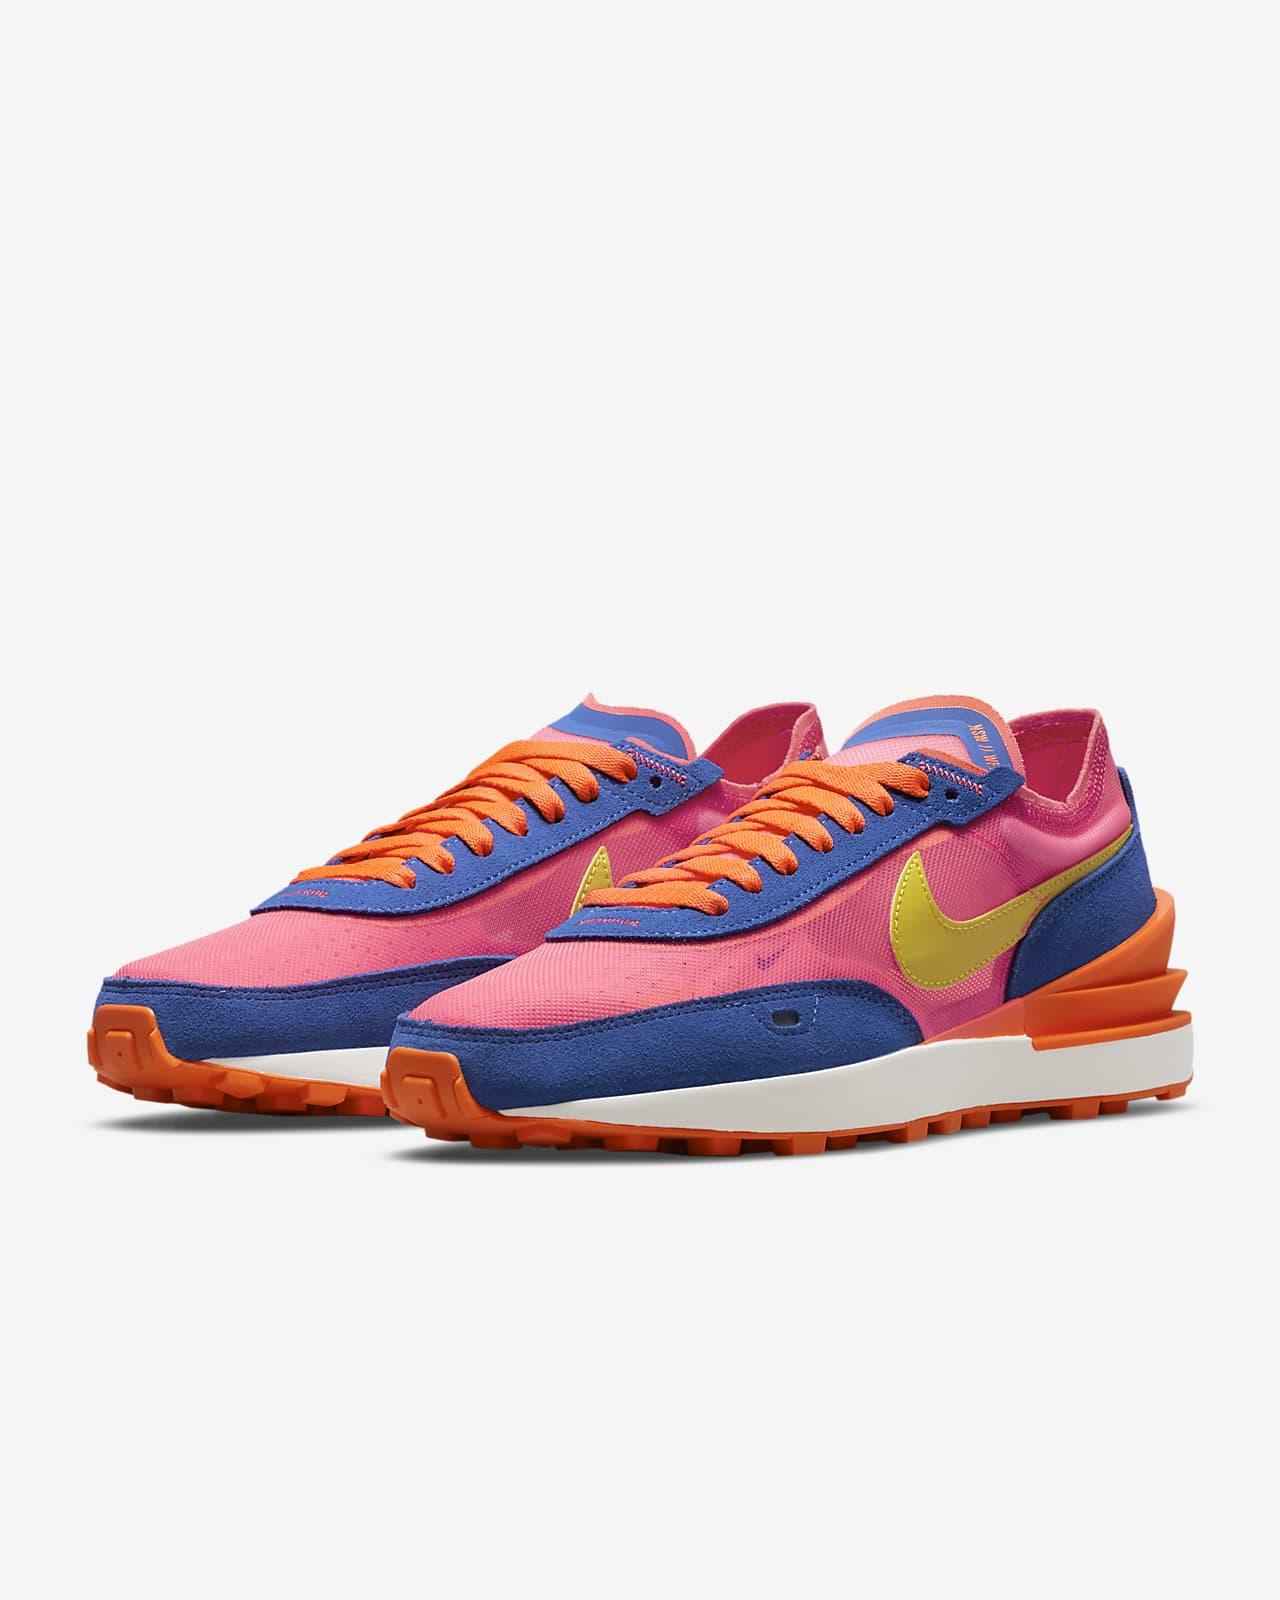 Chaussure Nike Waffle One pour Femme. Nike FR